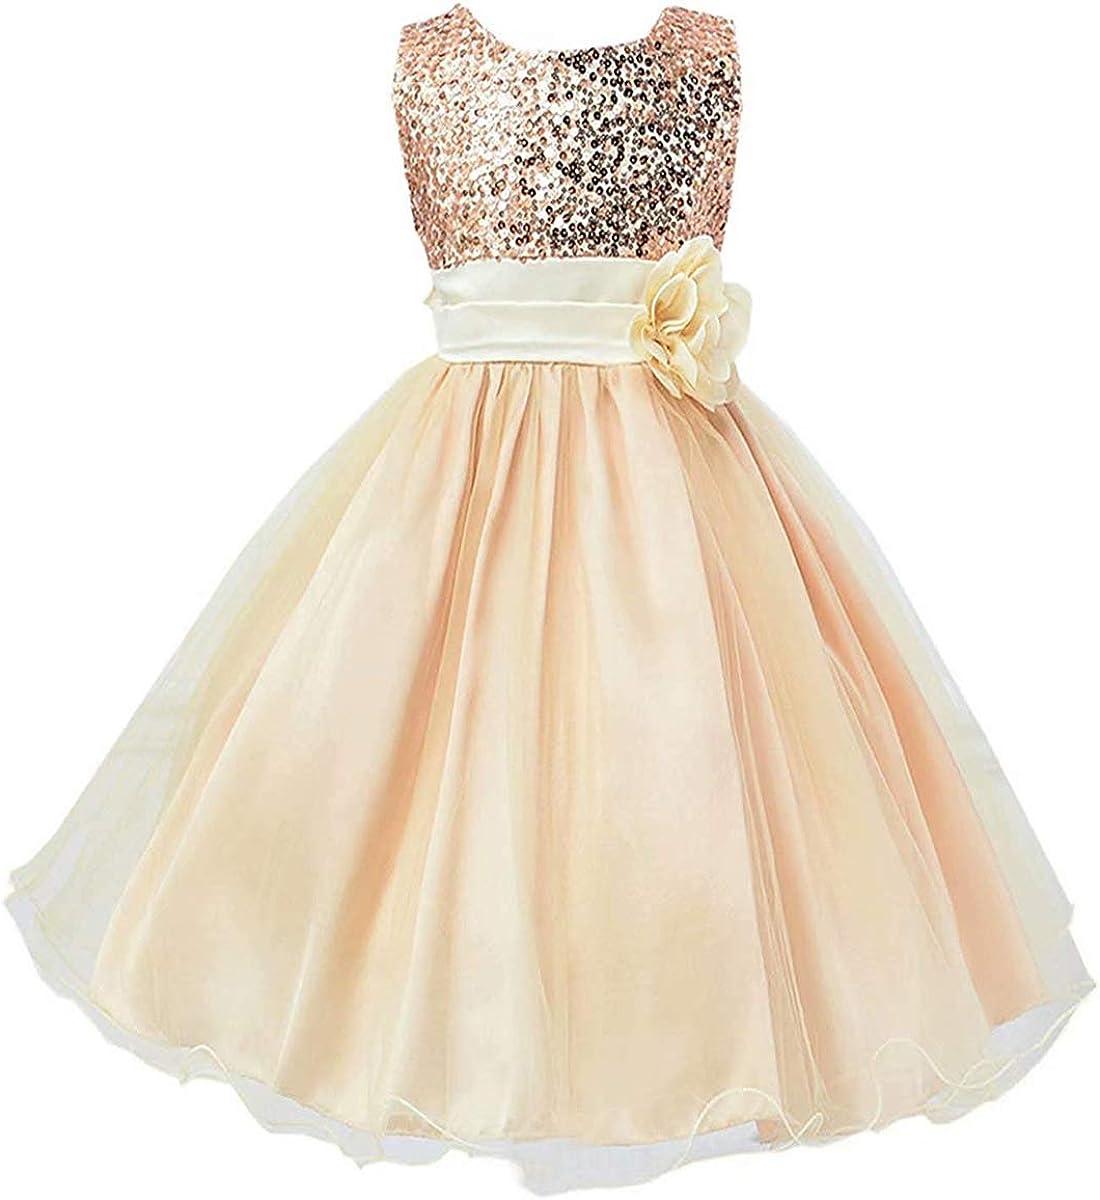 Girls Flower Lace Princess Dress Wedding Pageant Formal Dress 3-12 Years